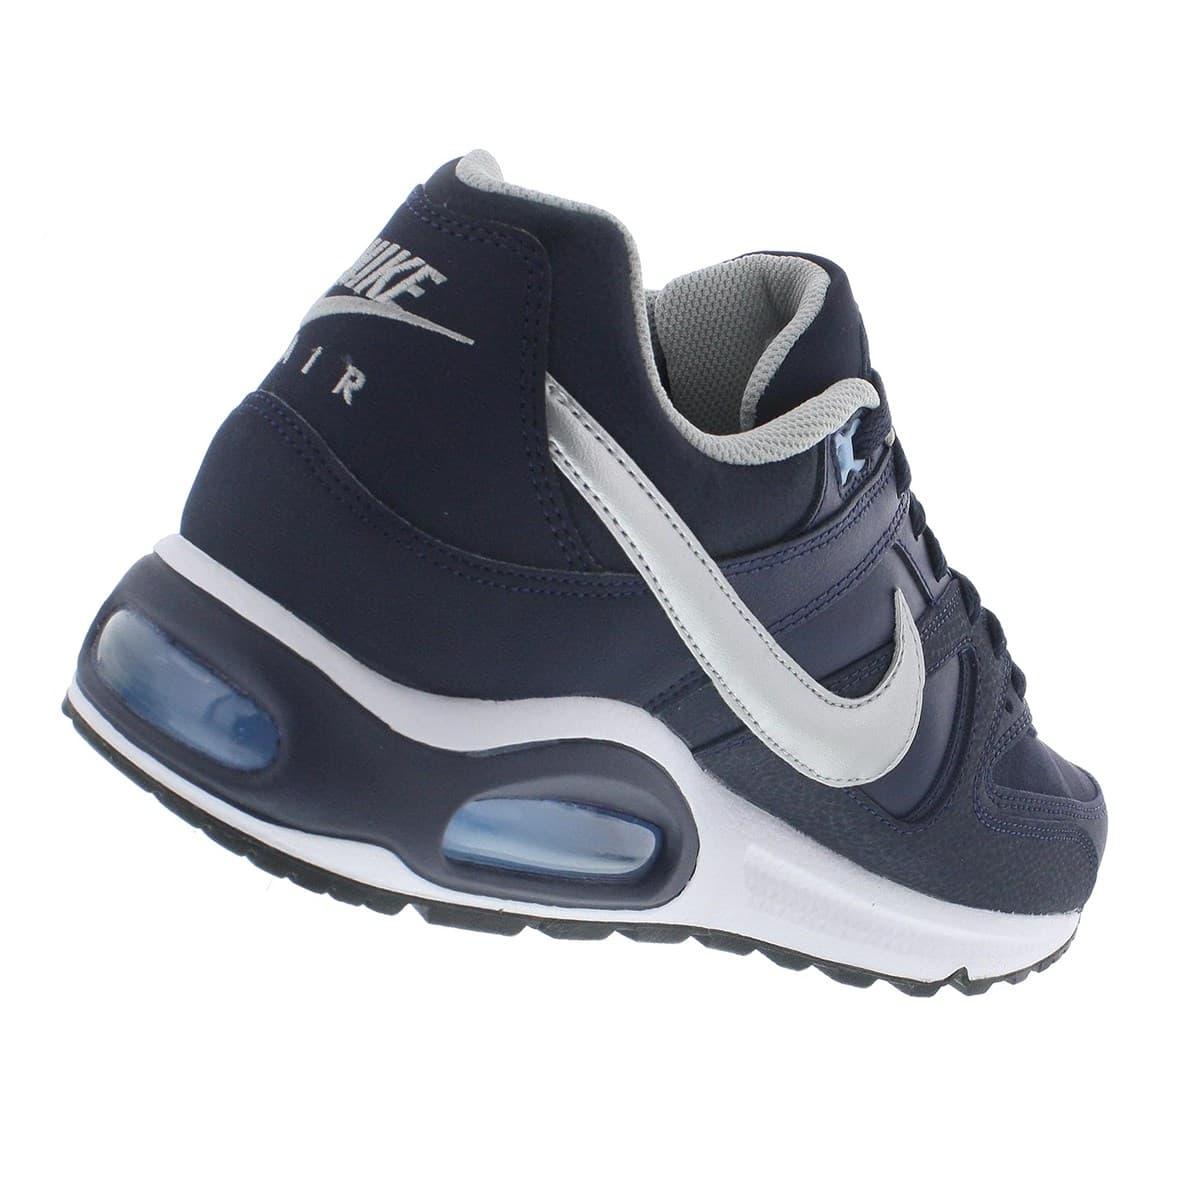 Air Max Command Leather Erkek Mavi Ayakkabı